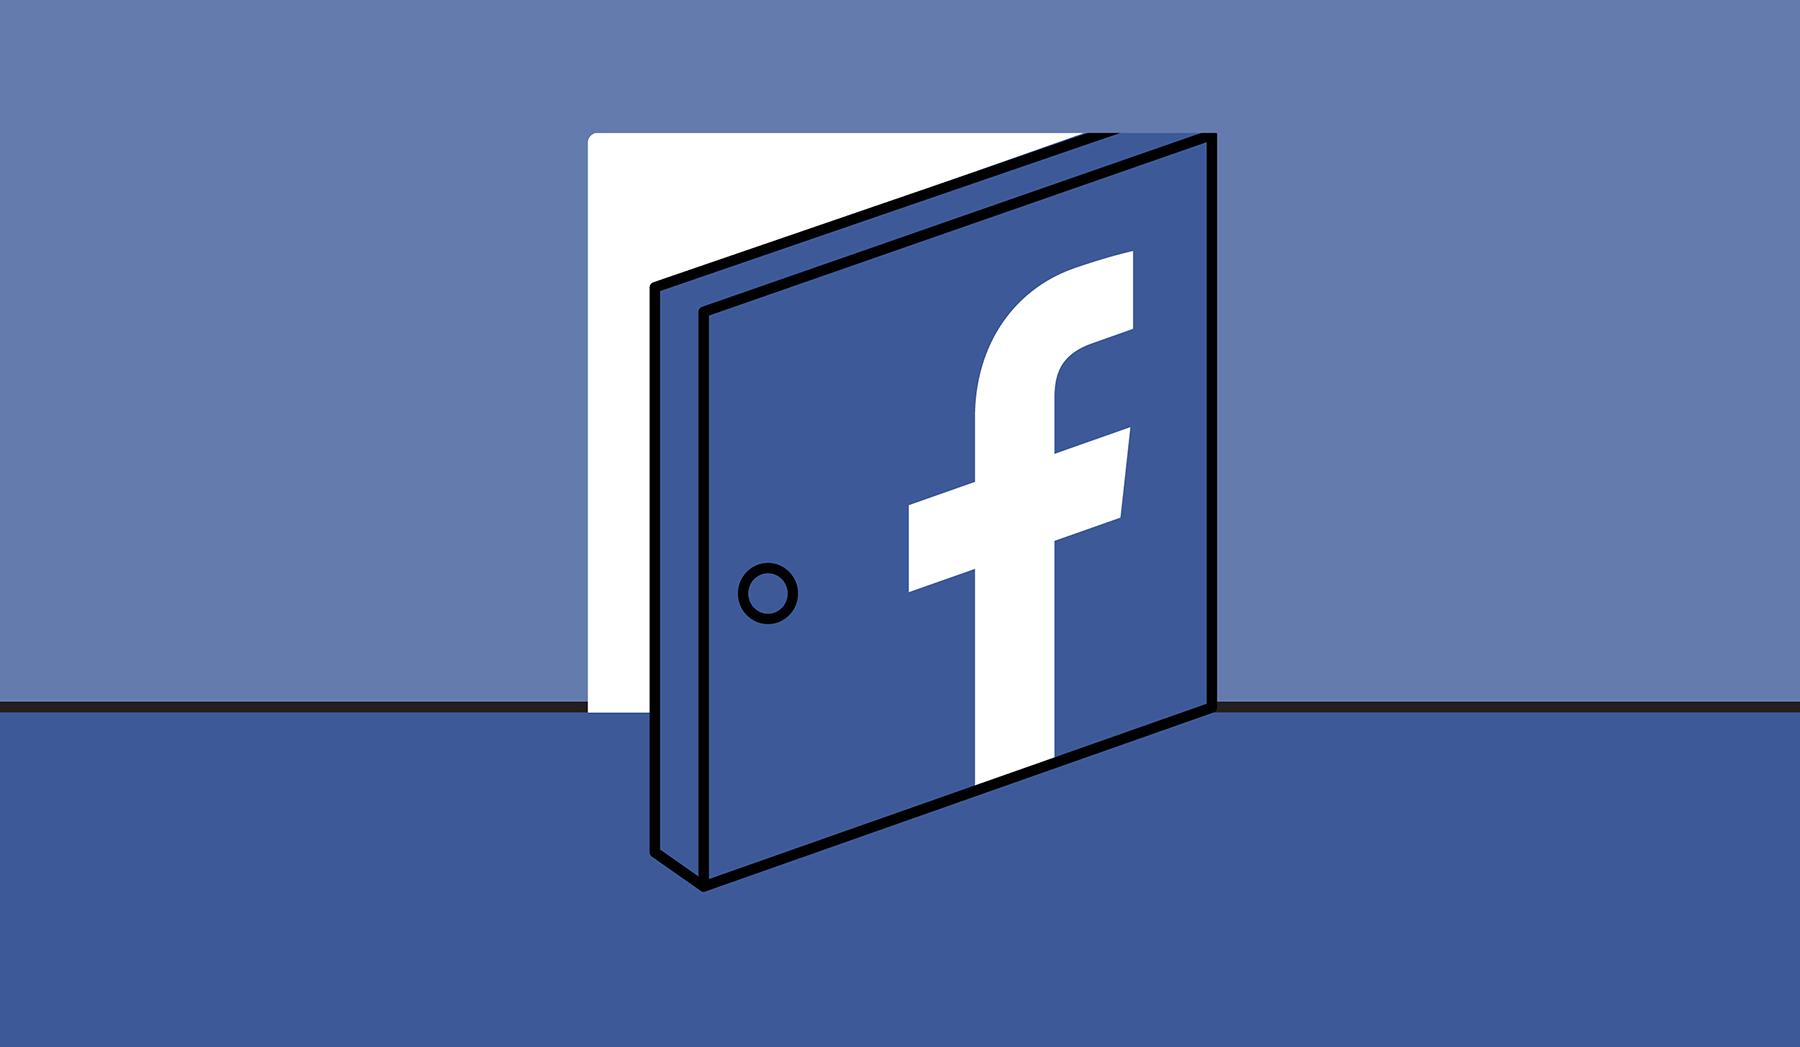 1800x1047 > Facebook Wallpapers